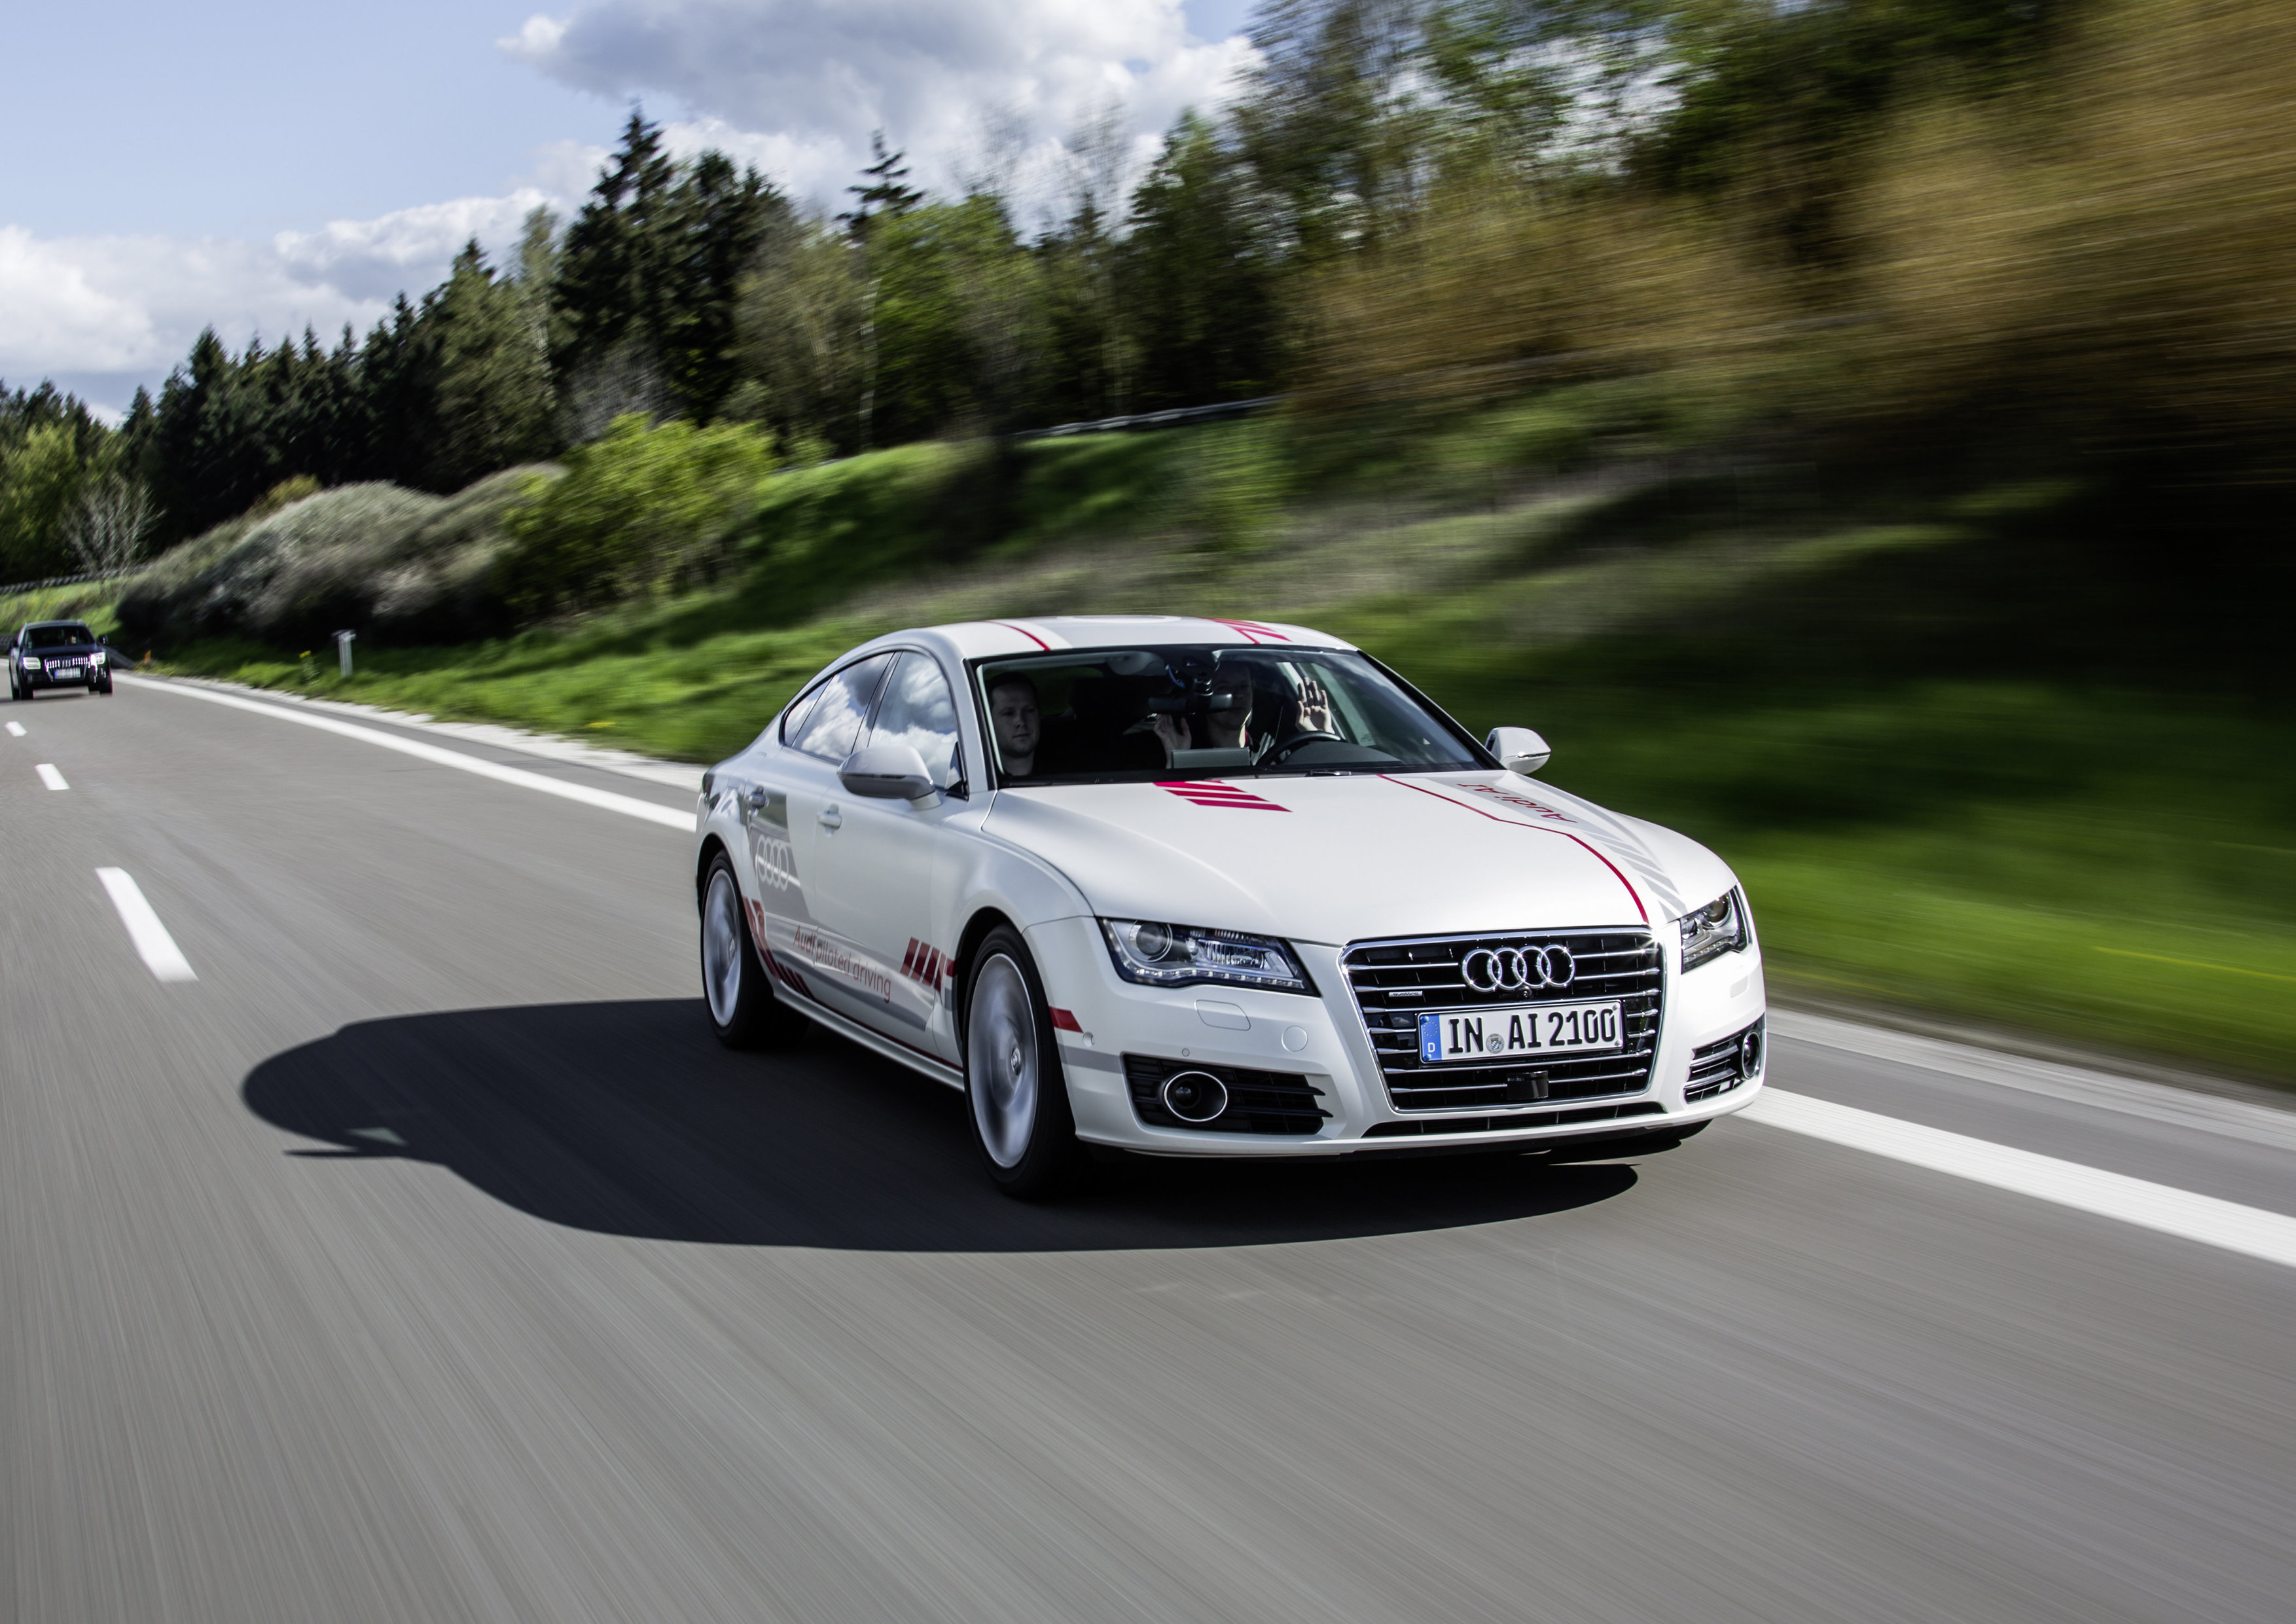 Audi Claims Its Self-Driving Car Has Social Skills